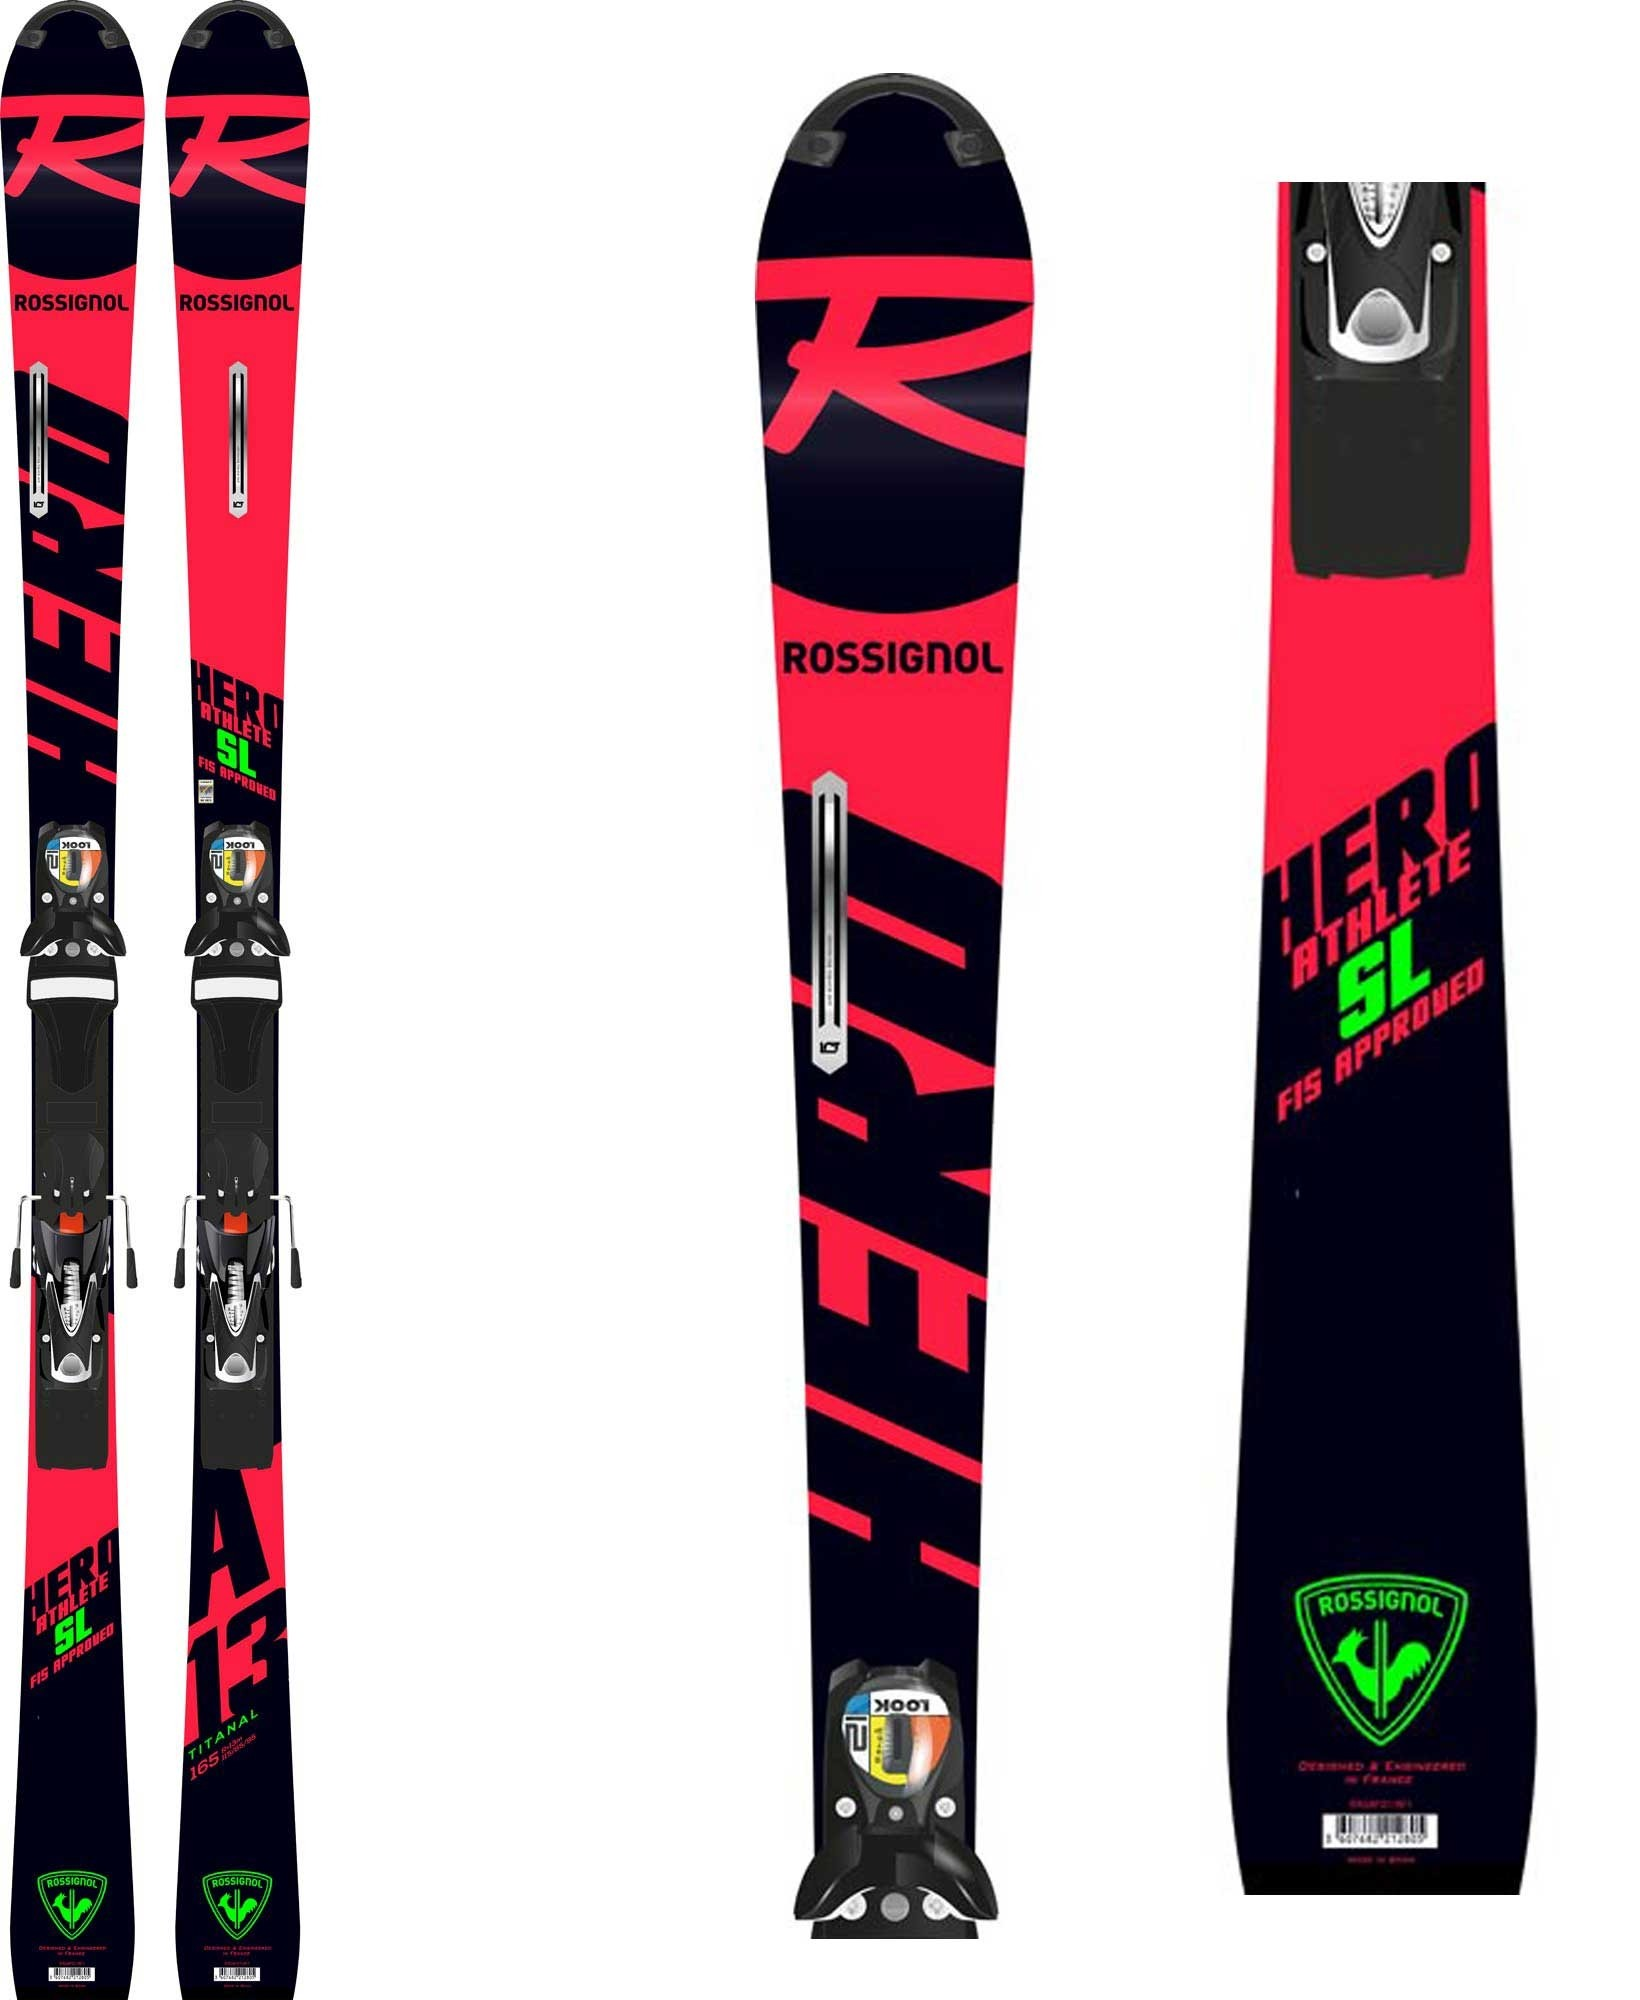 e94eaa74a10 Rossignol skis Hero Athlete FIS SL (R22), 2019